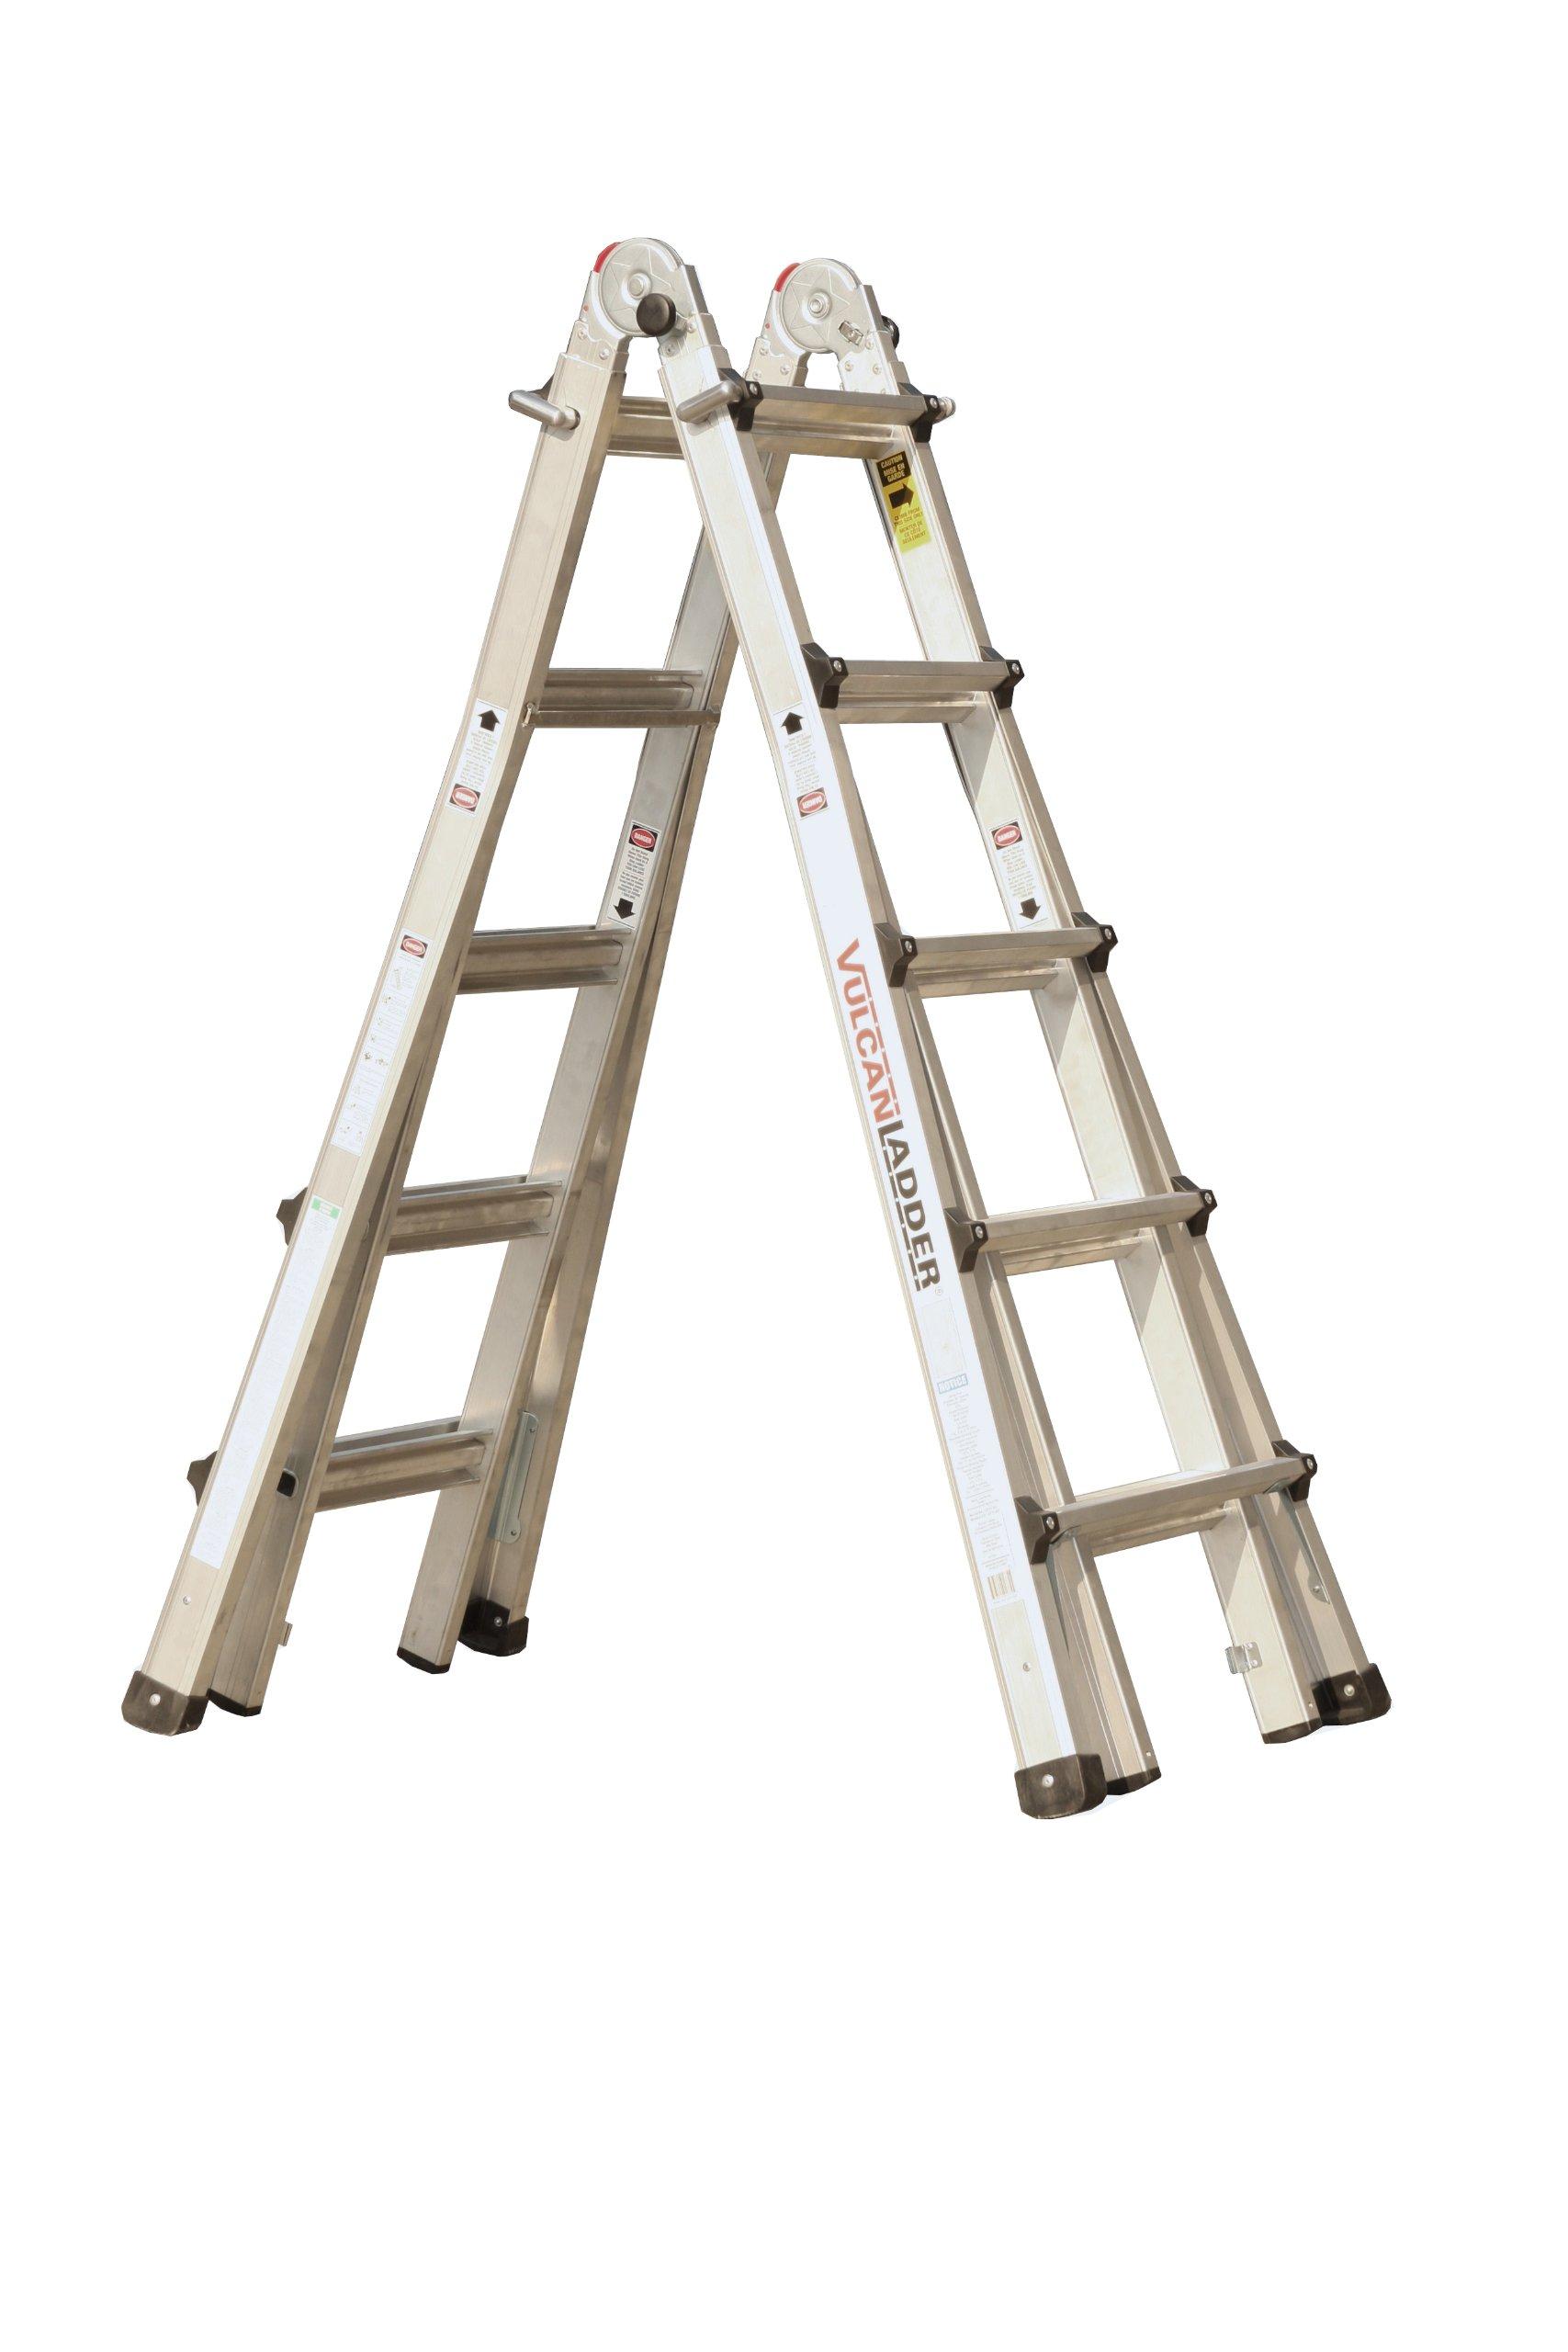 Vulcan Ladder USA ES-21T11G1 21-Feet Multi Task Ladder